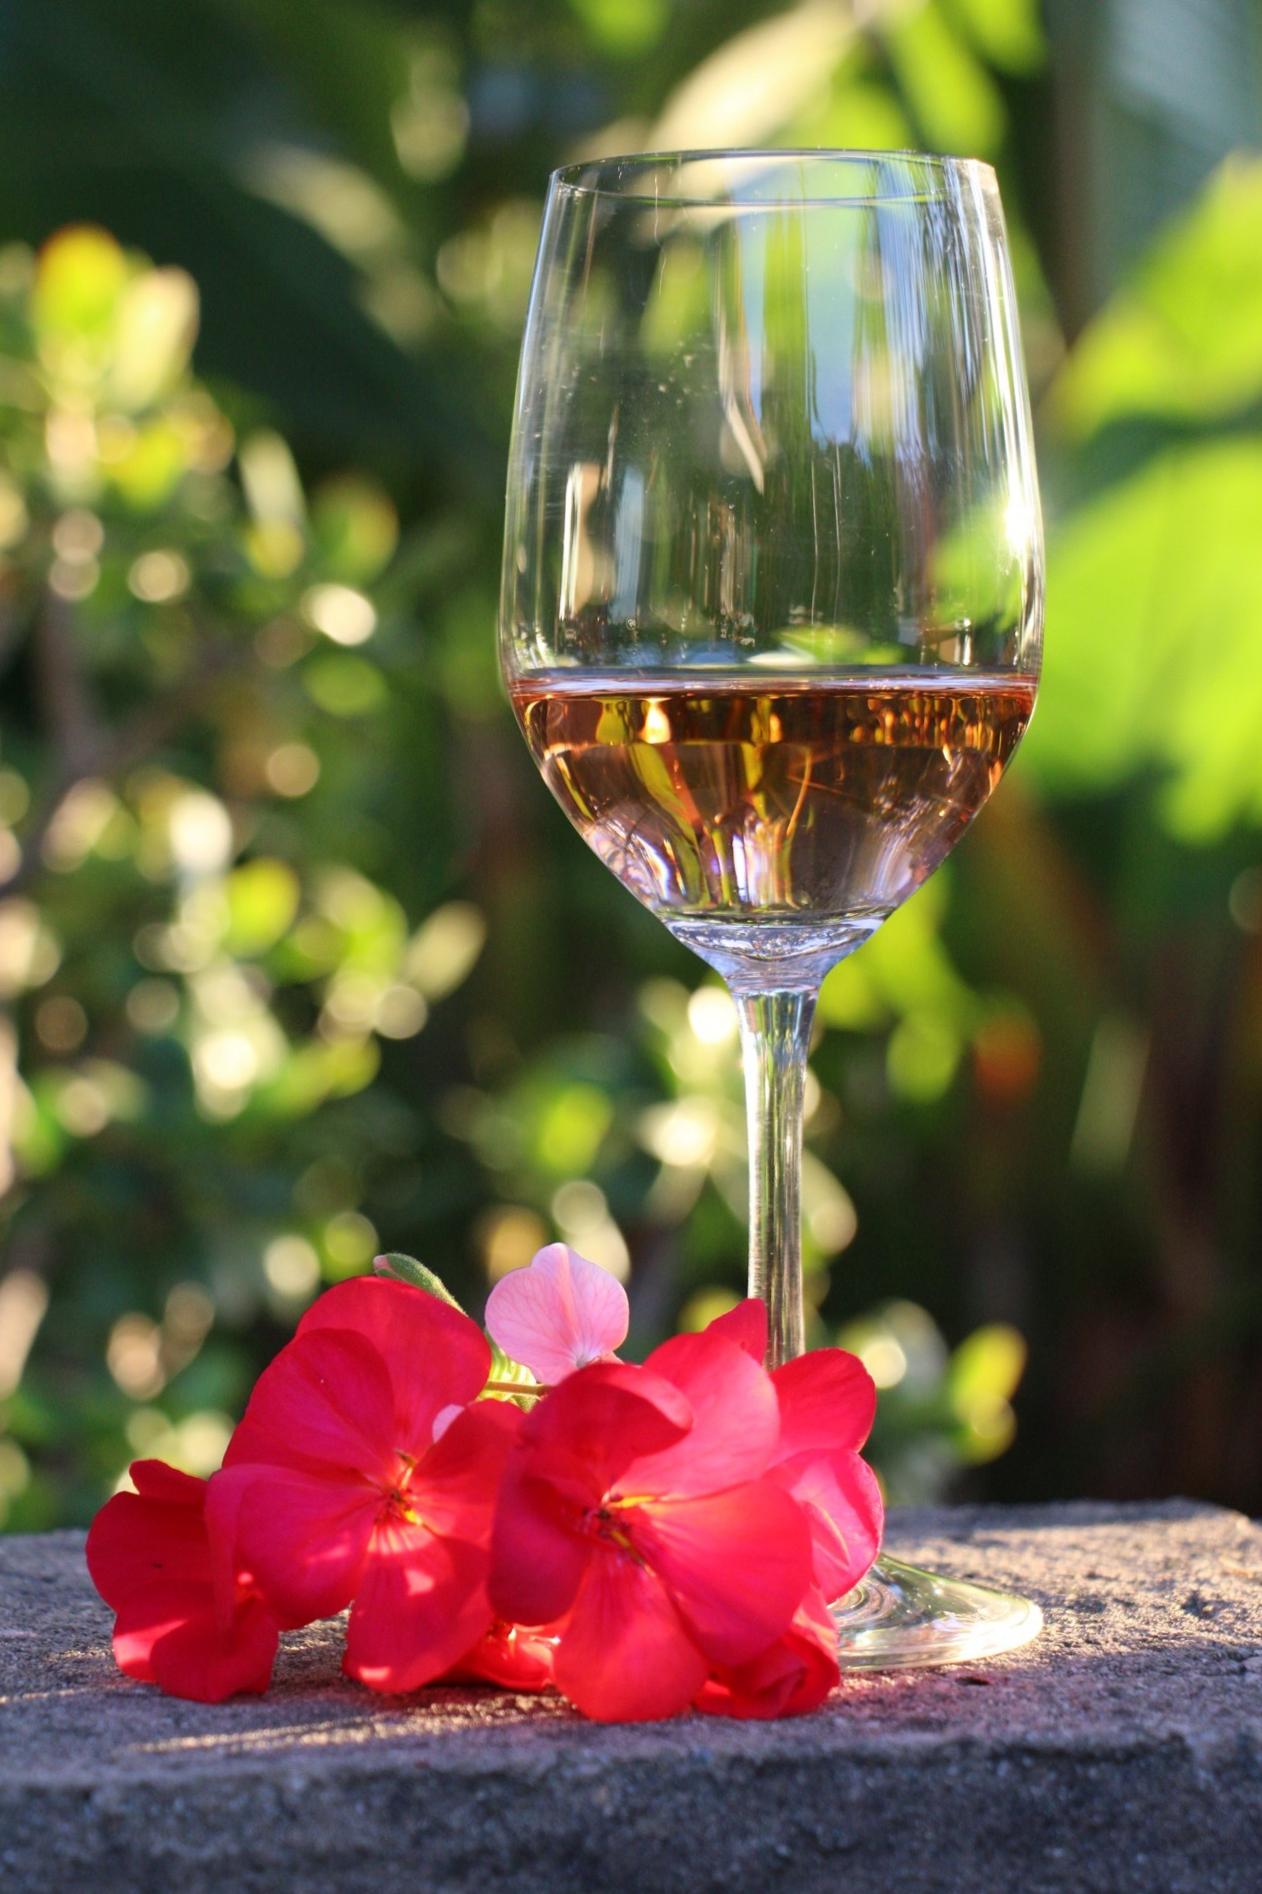 trader joe's wine reviews budget wine rose